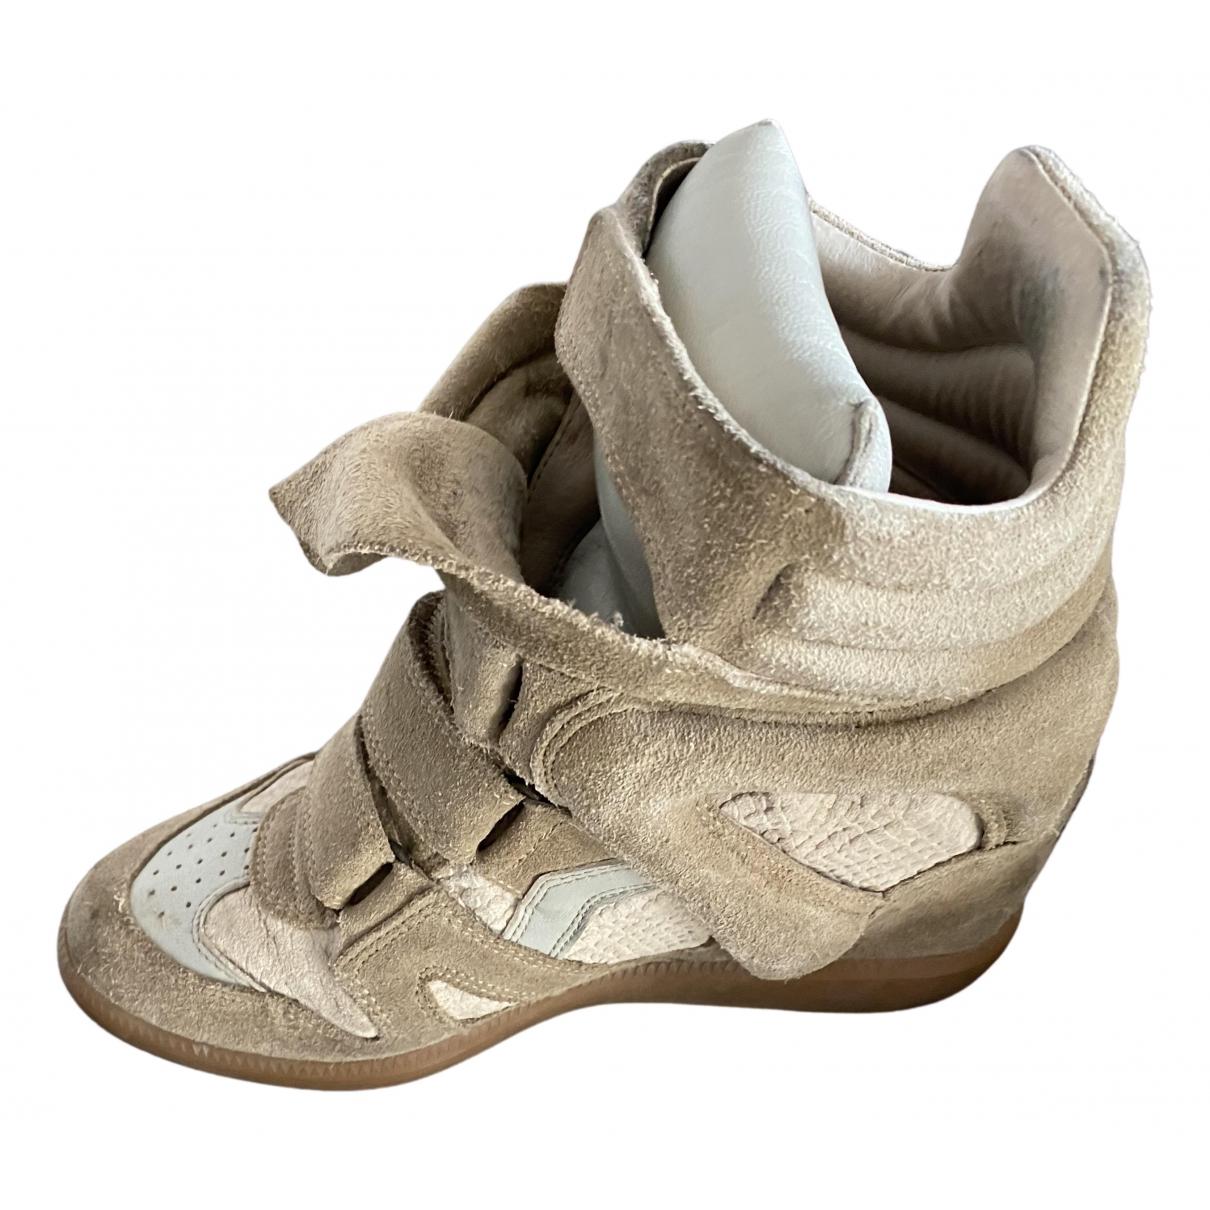 Isabel Marant - Baskets Beckett pour femme en toile - beige